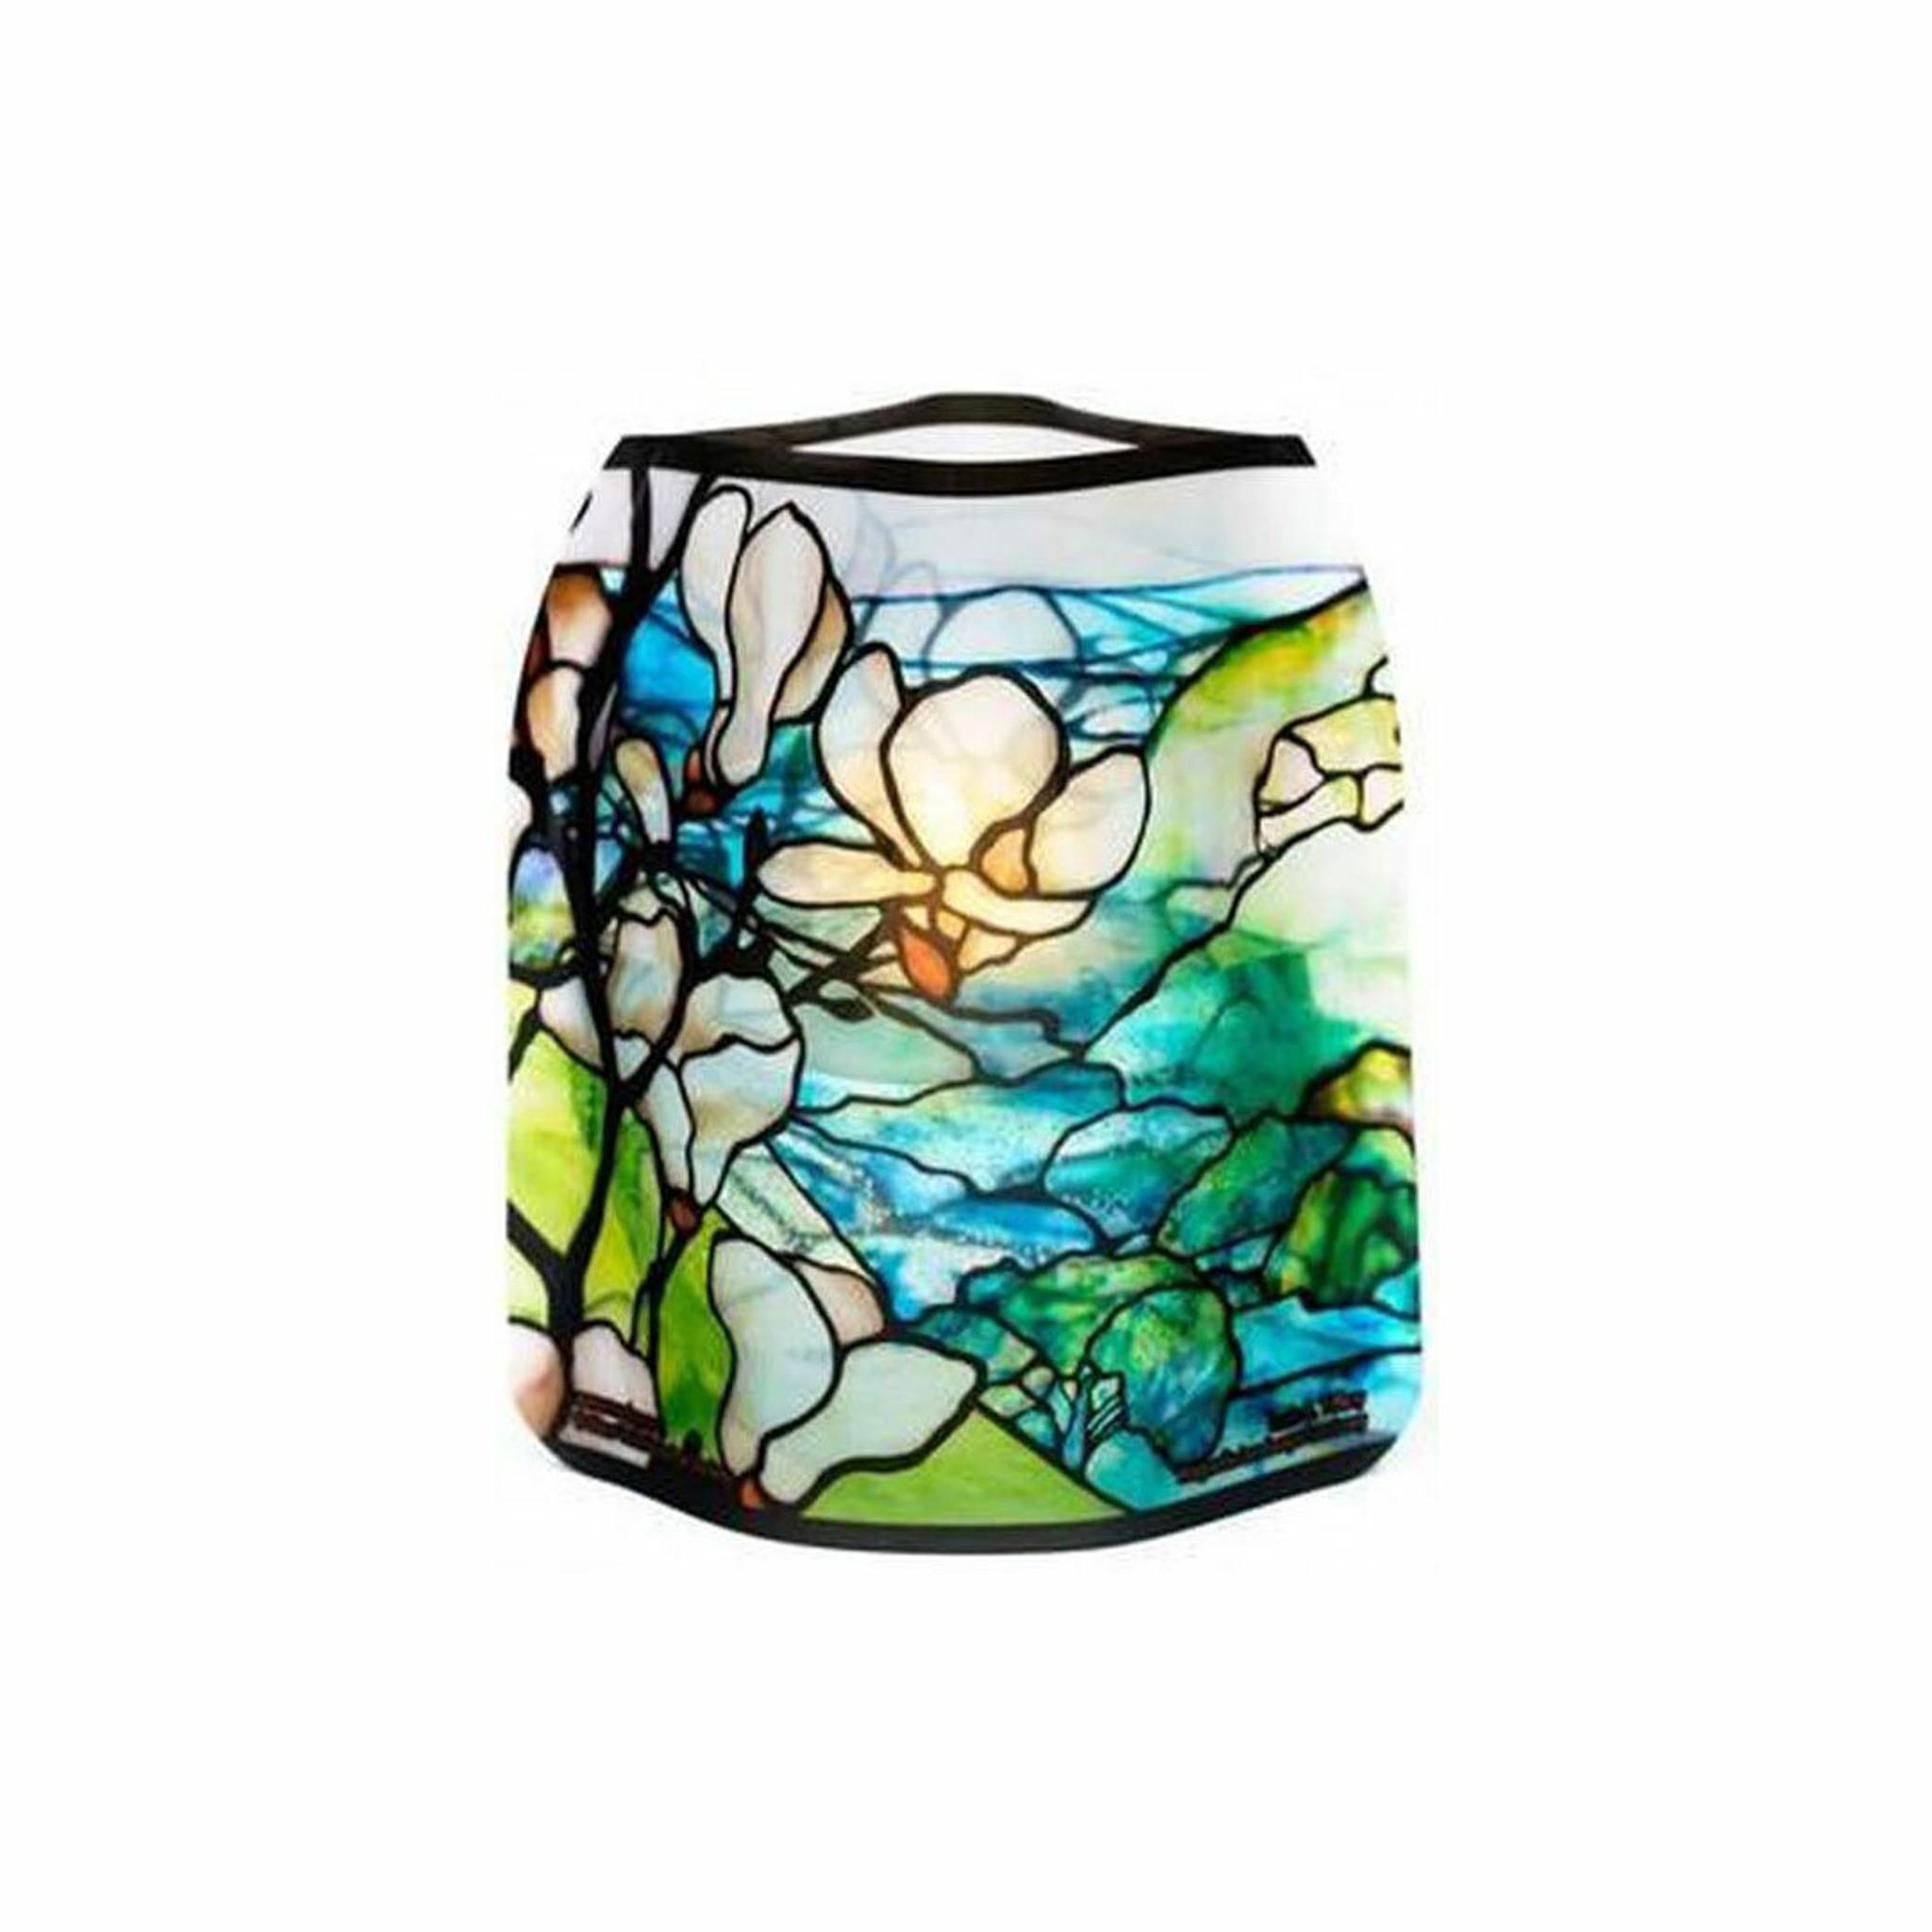 Modgy Luminary Lantern Set - Louis C. Tiffany - Magnolia Landscape